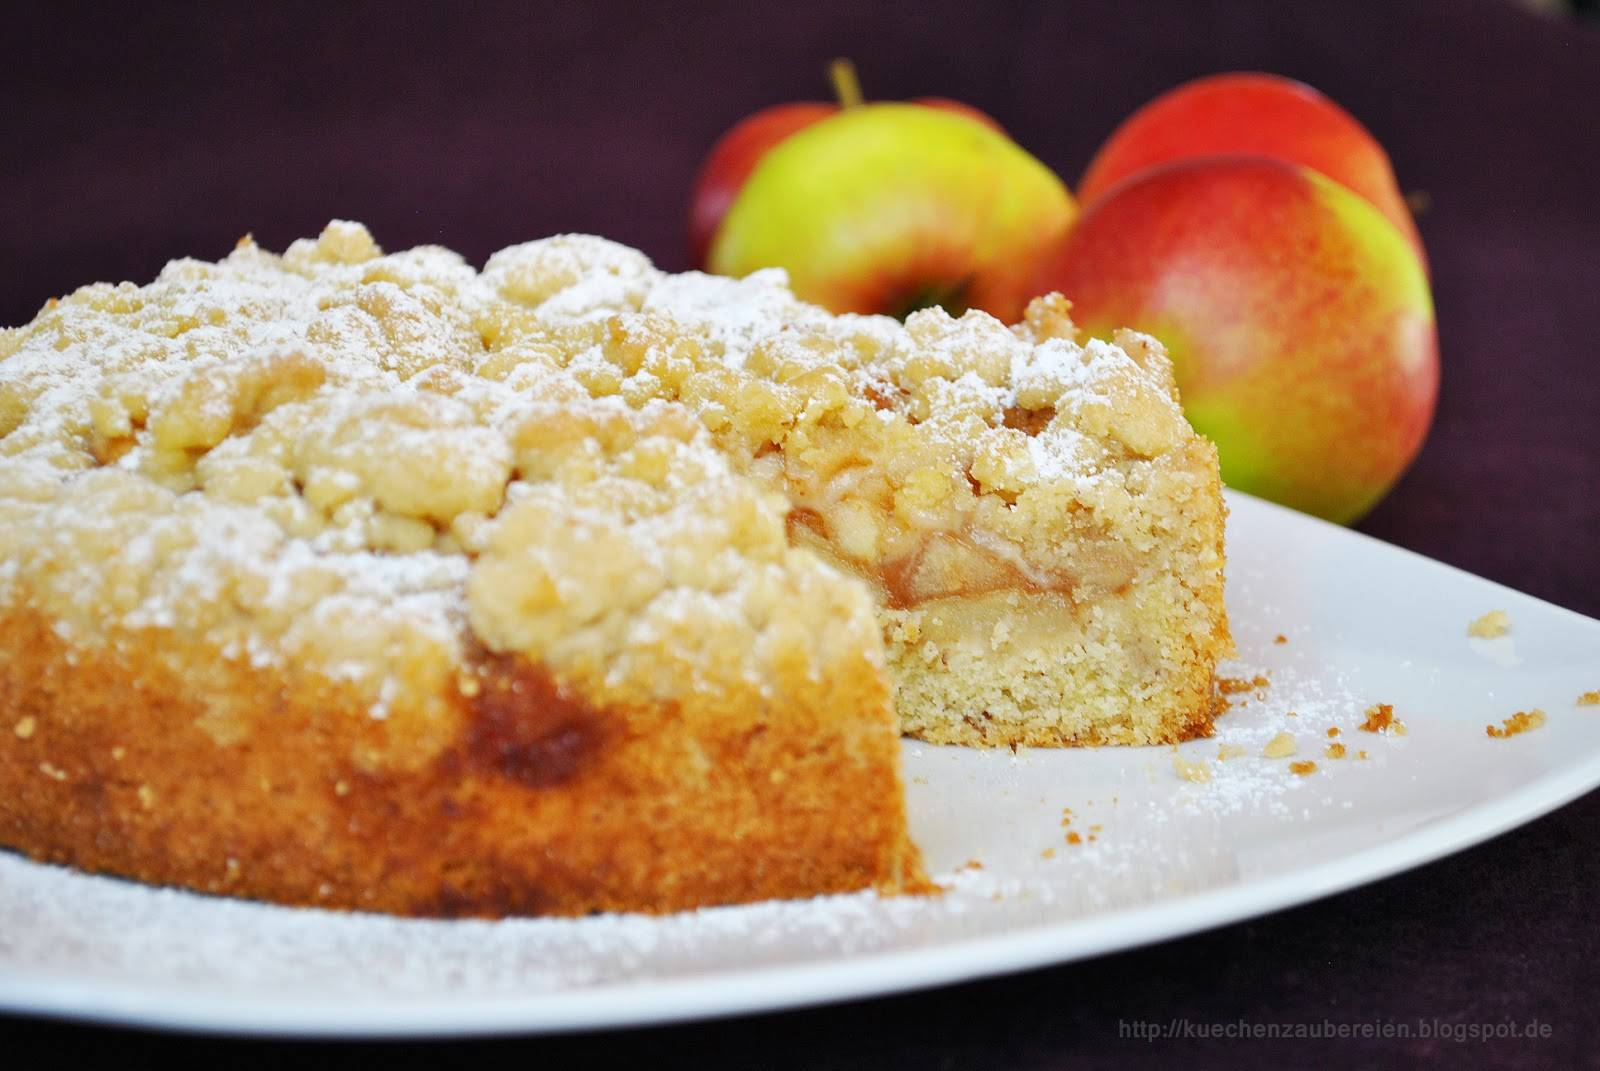 Немецкий пирог кухен - рецепт с фото пошагово